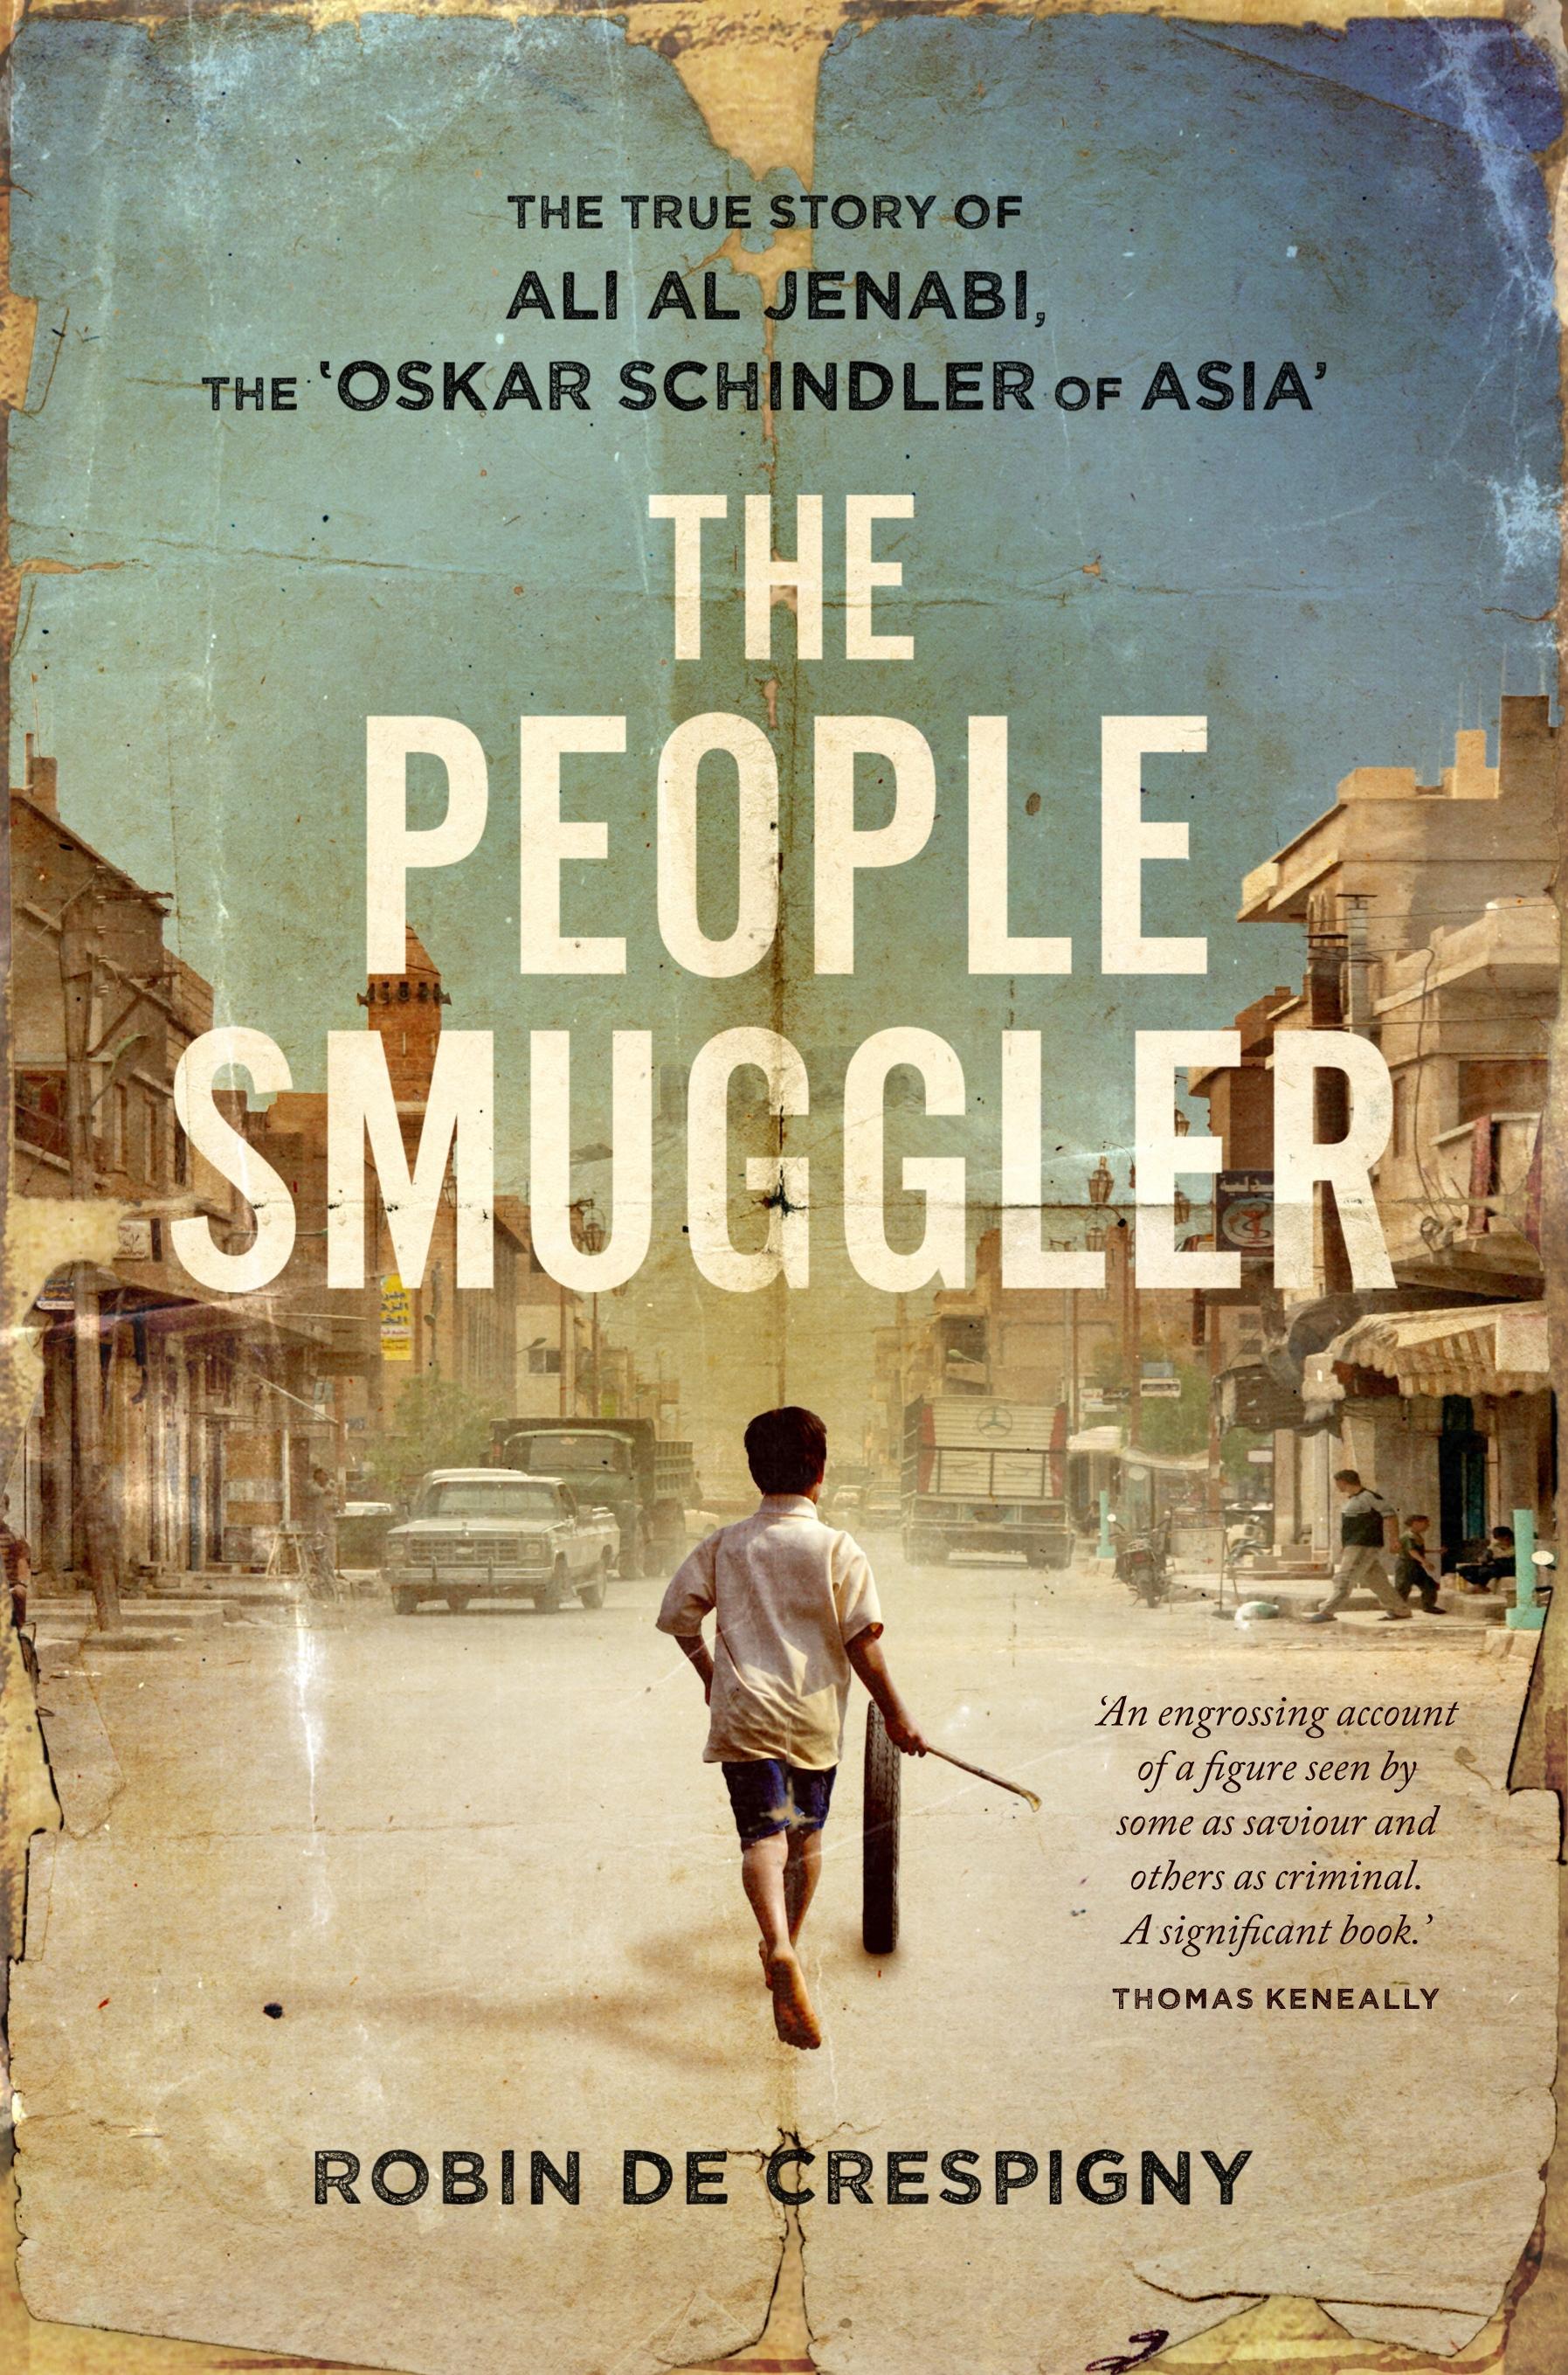 True Story Magazine Subscription: People Smuggler: The True Story Of Ali Al Jenabi, The